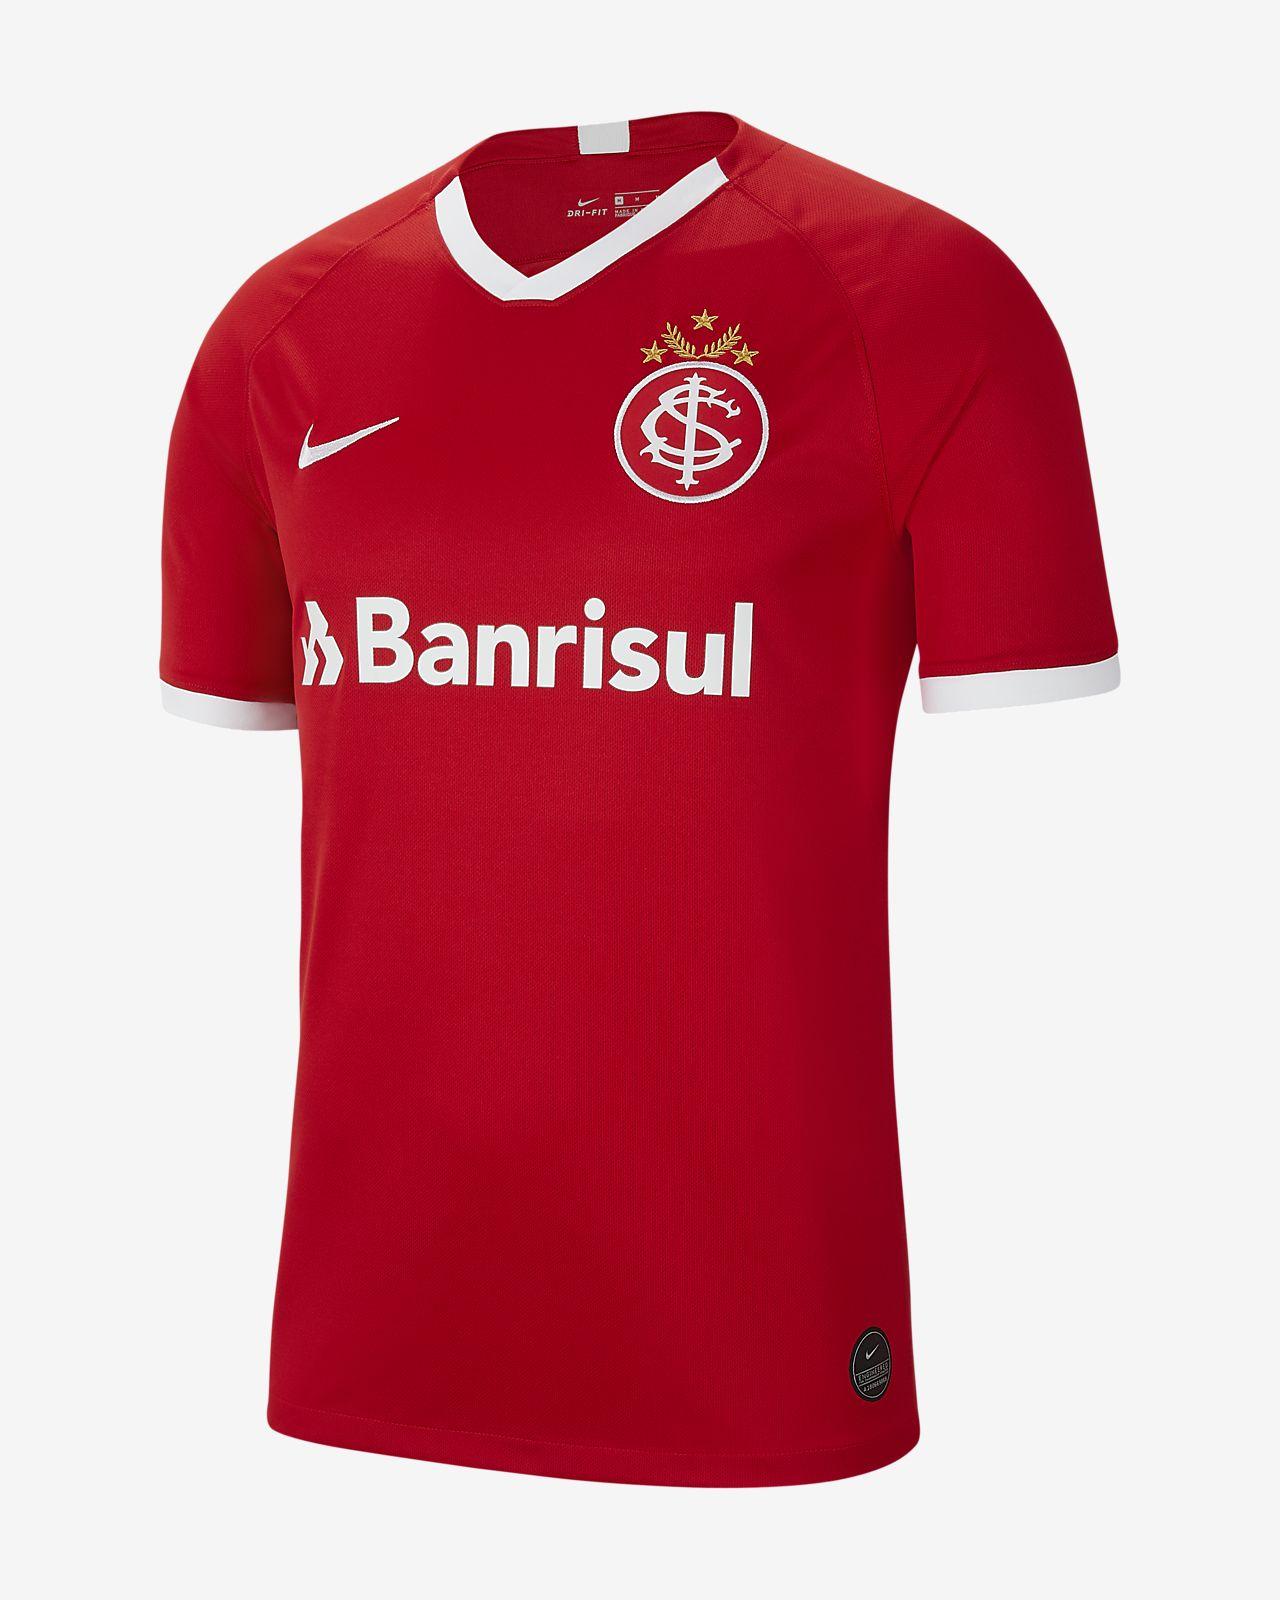 Męska wyjazdowa koszulka piłkarska S.C. koszulka piłkarska S.C. Internacional 2019/20 Stadium Home